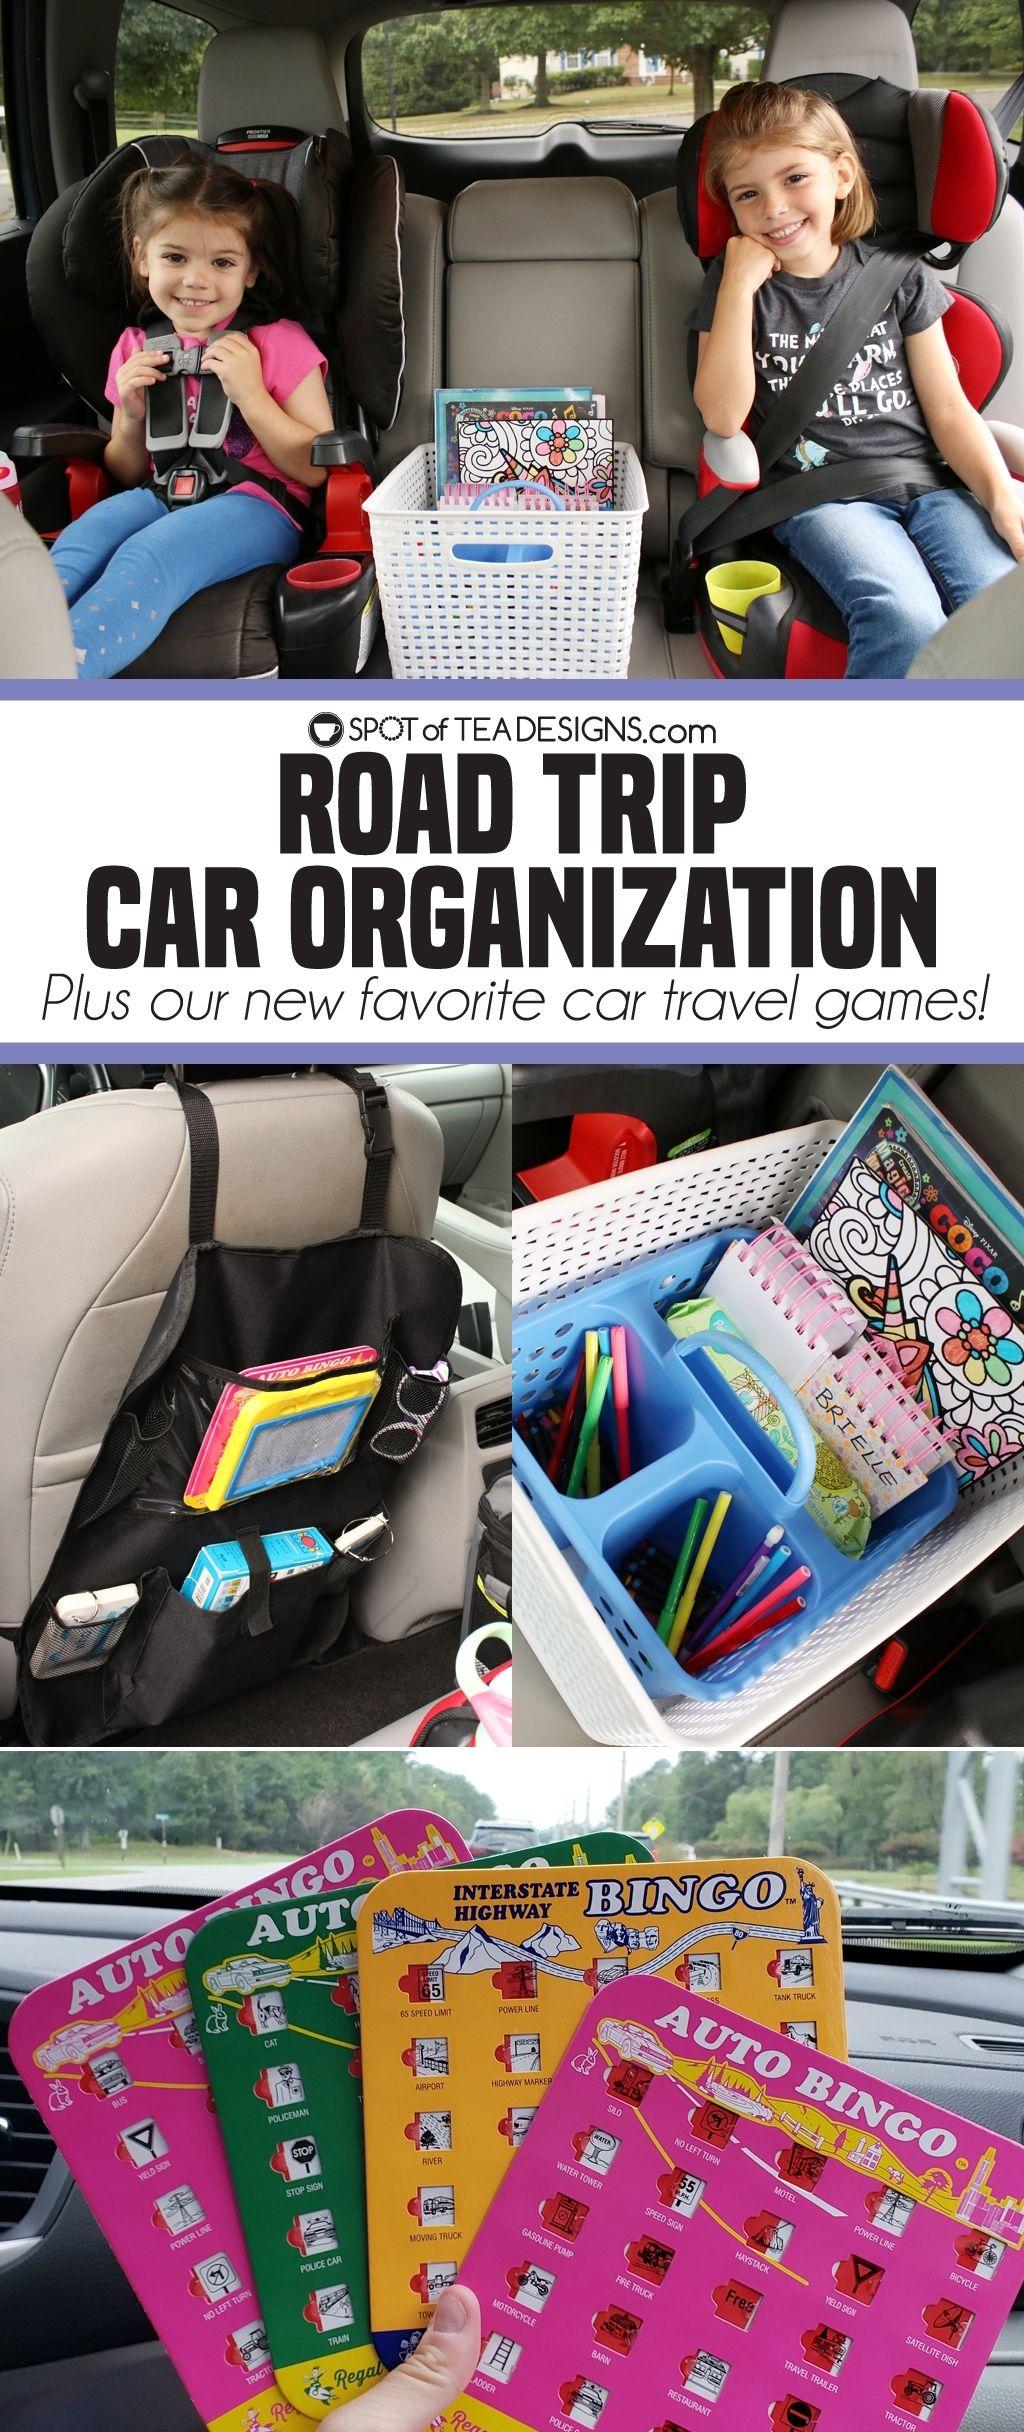 Road Trip Car Organization Tea design, Road trip